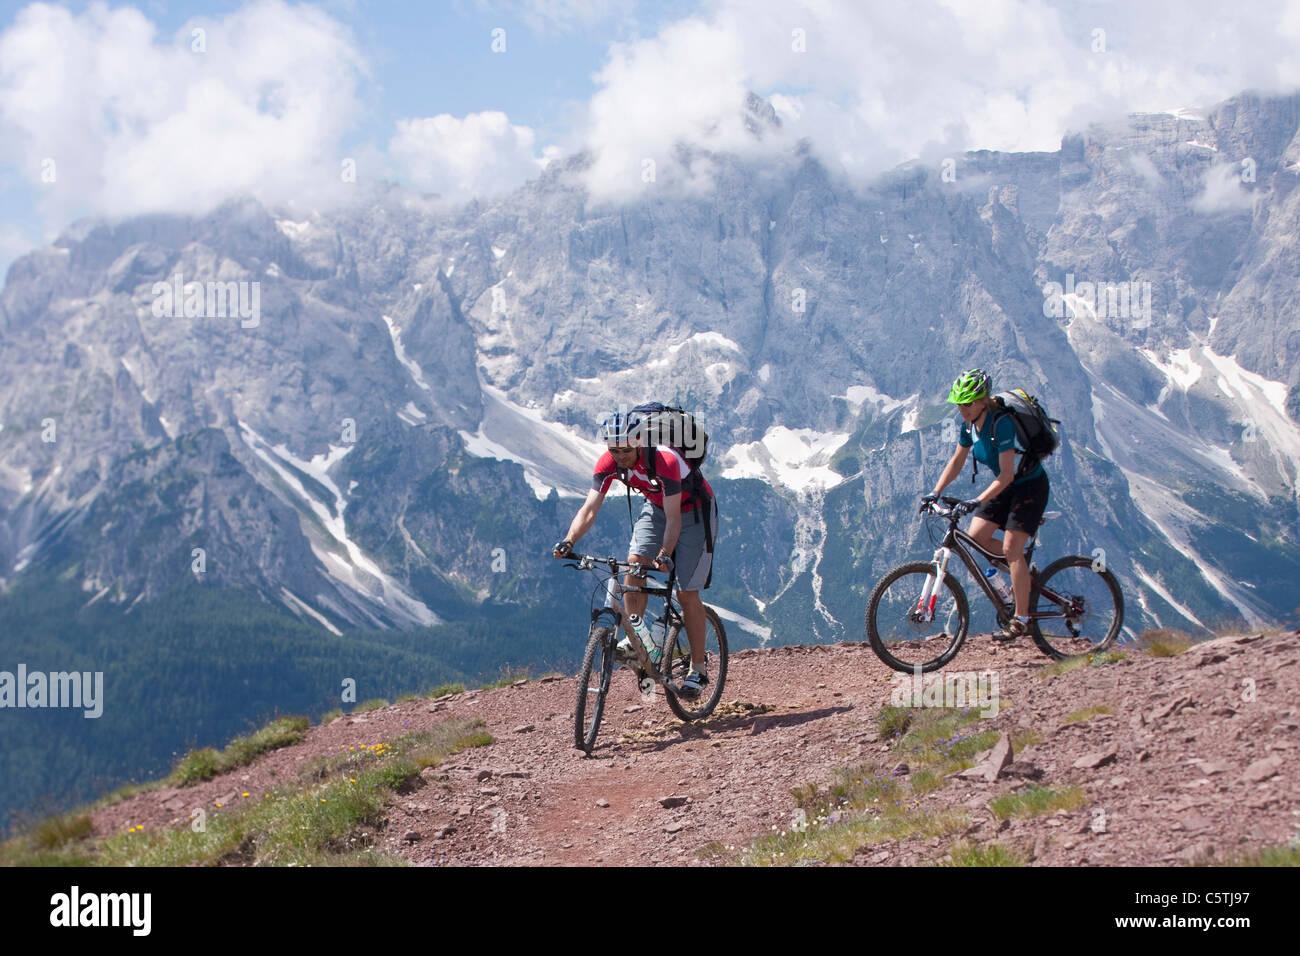 Italia, dolomitas, par ir en bici Imagen De Stock